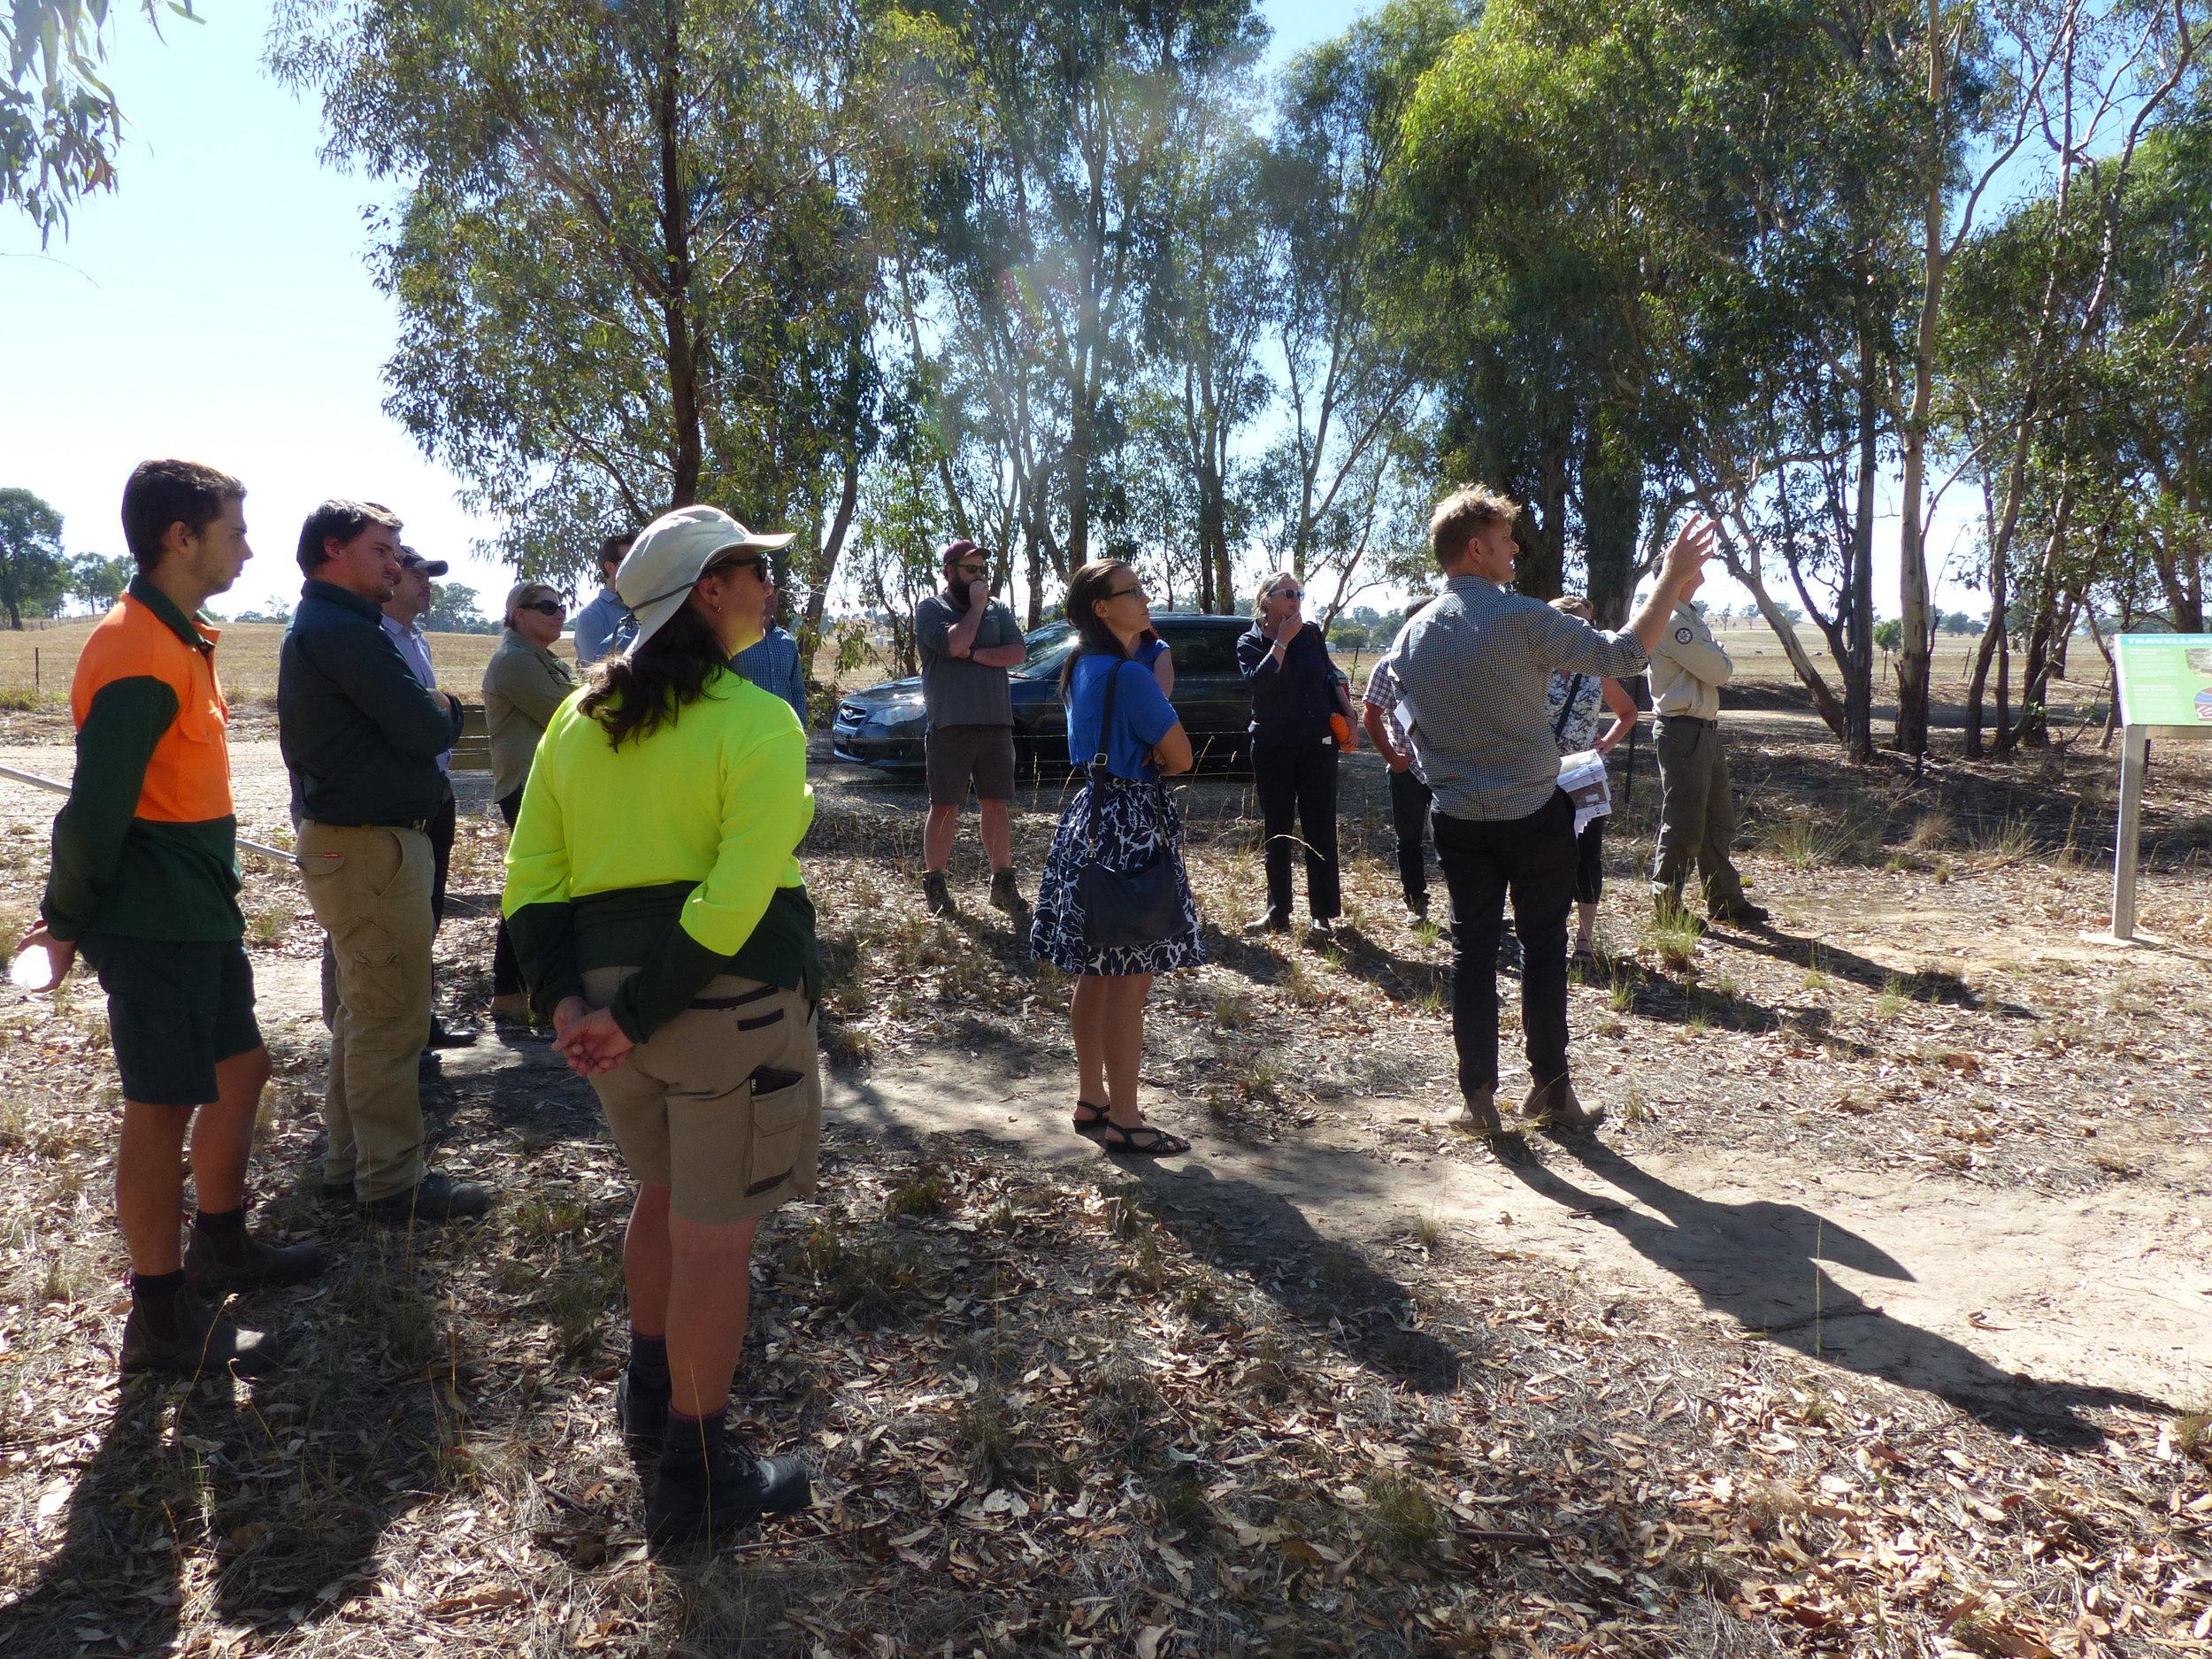 Hollow bearing tree Workshop_site visit 2_28thFeb2018.JPG